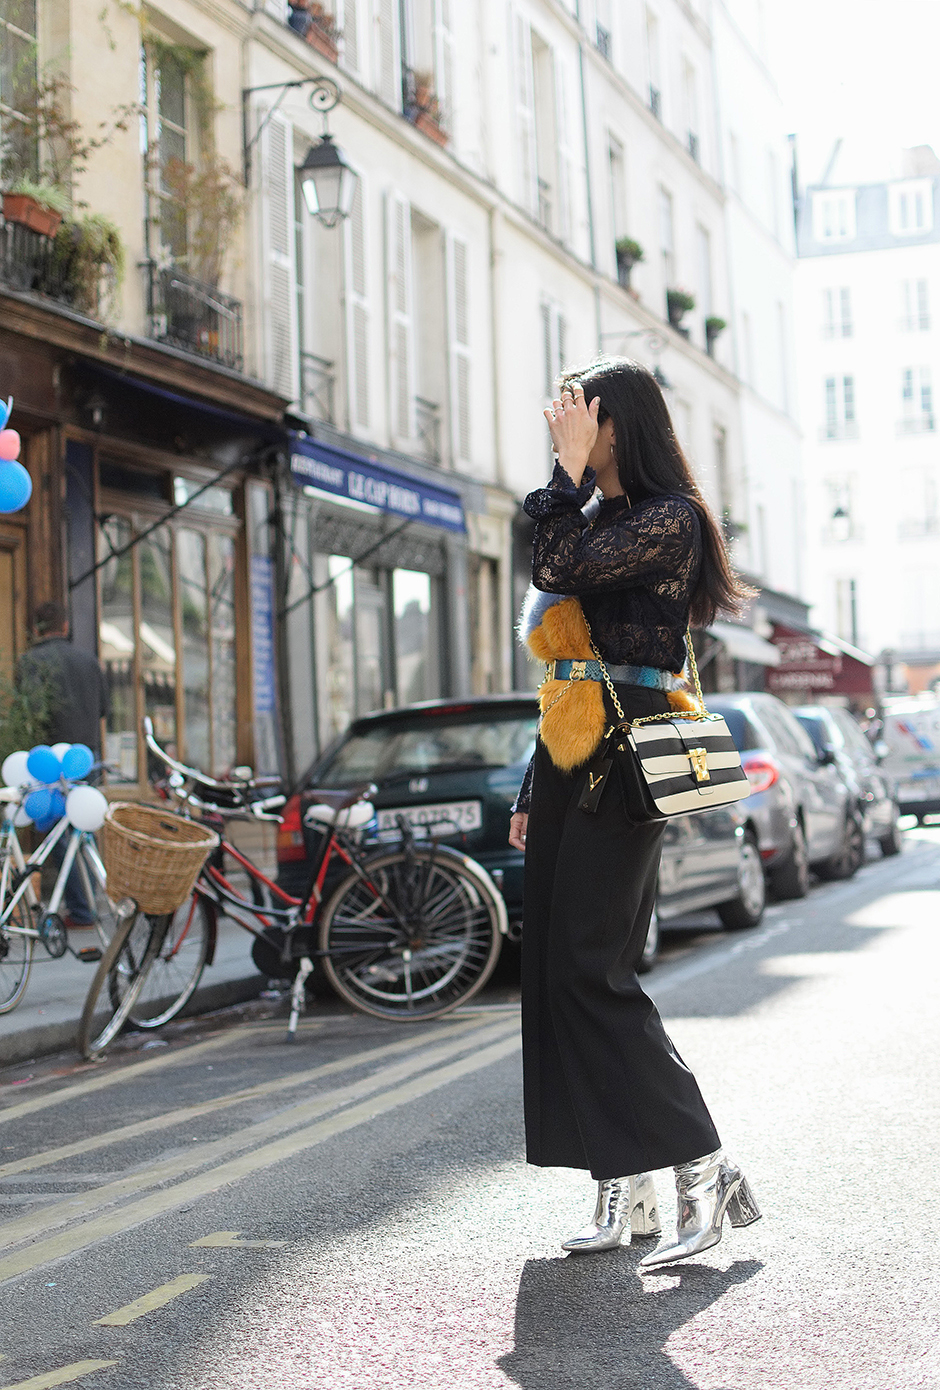 #streetstyle #outfit #pfw #pfw17 #ss18 #paris #fashionweek #runwayshow #trends #fashion #dresses #fashionblog #blogger #blog #fashionblogger #trends #fashiontrend #styleblog